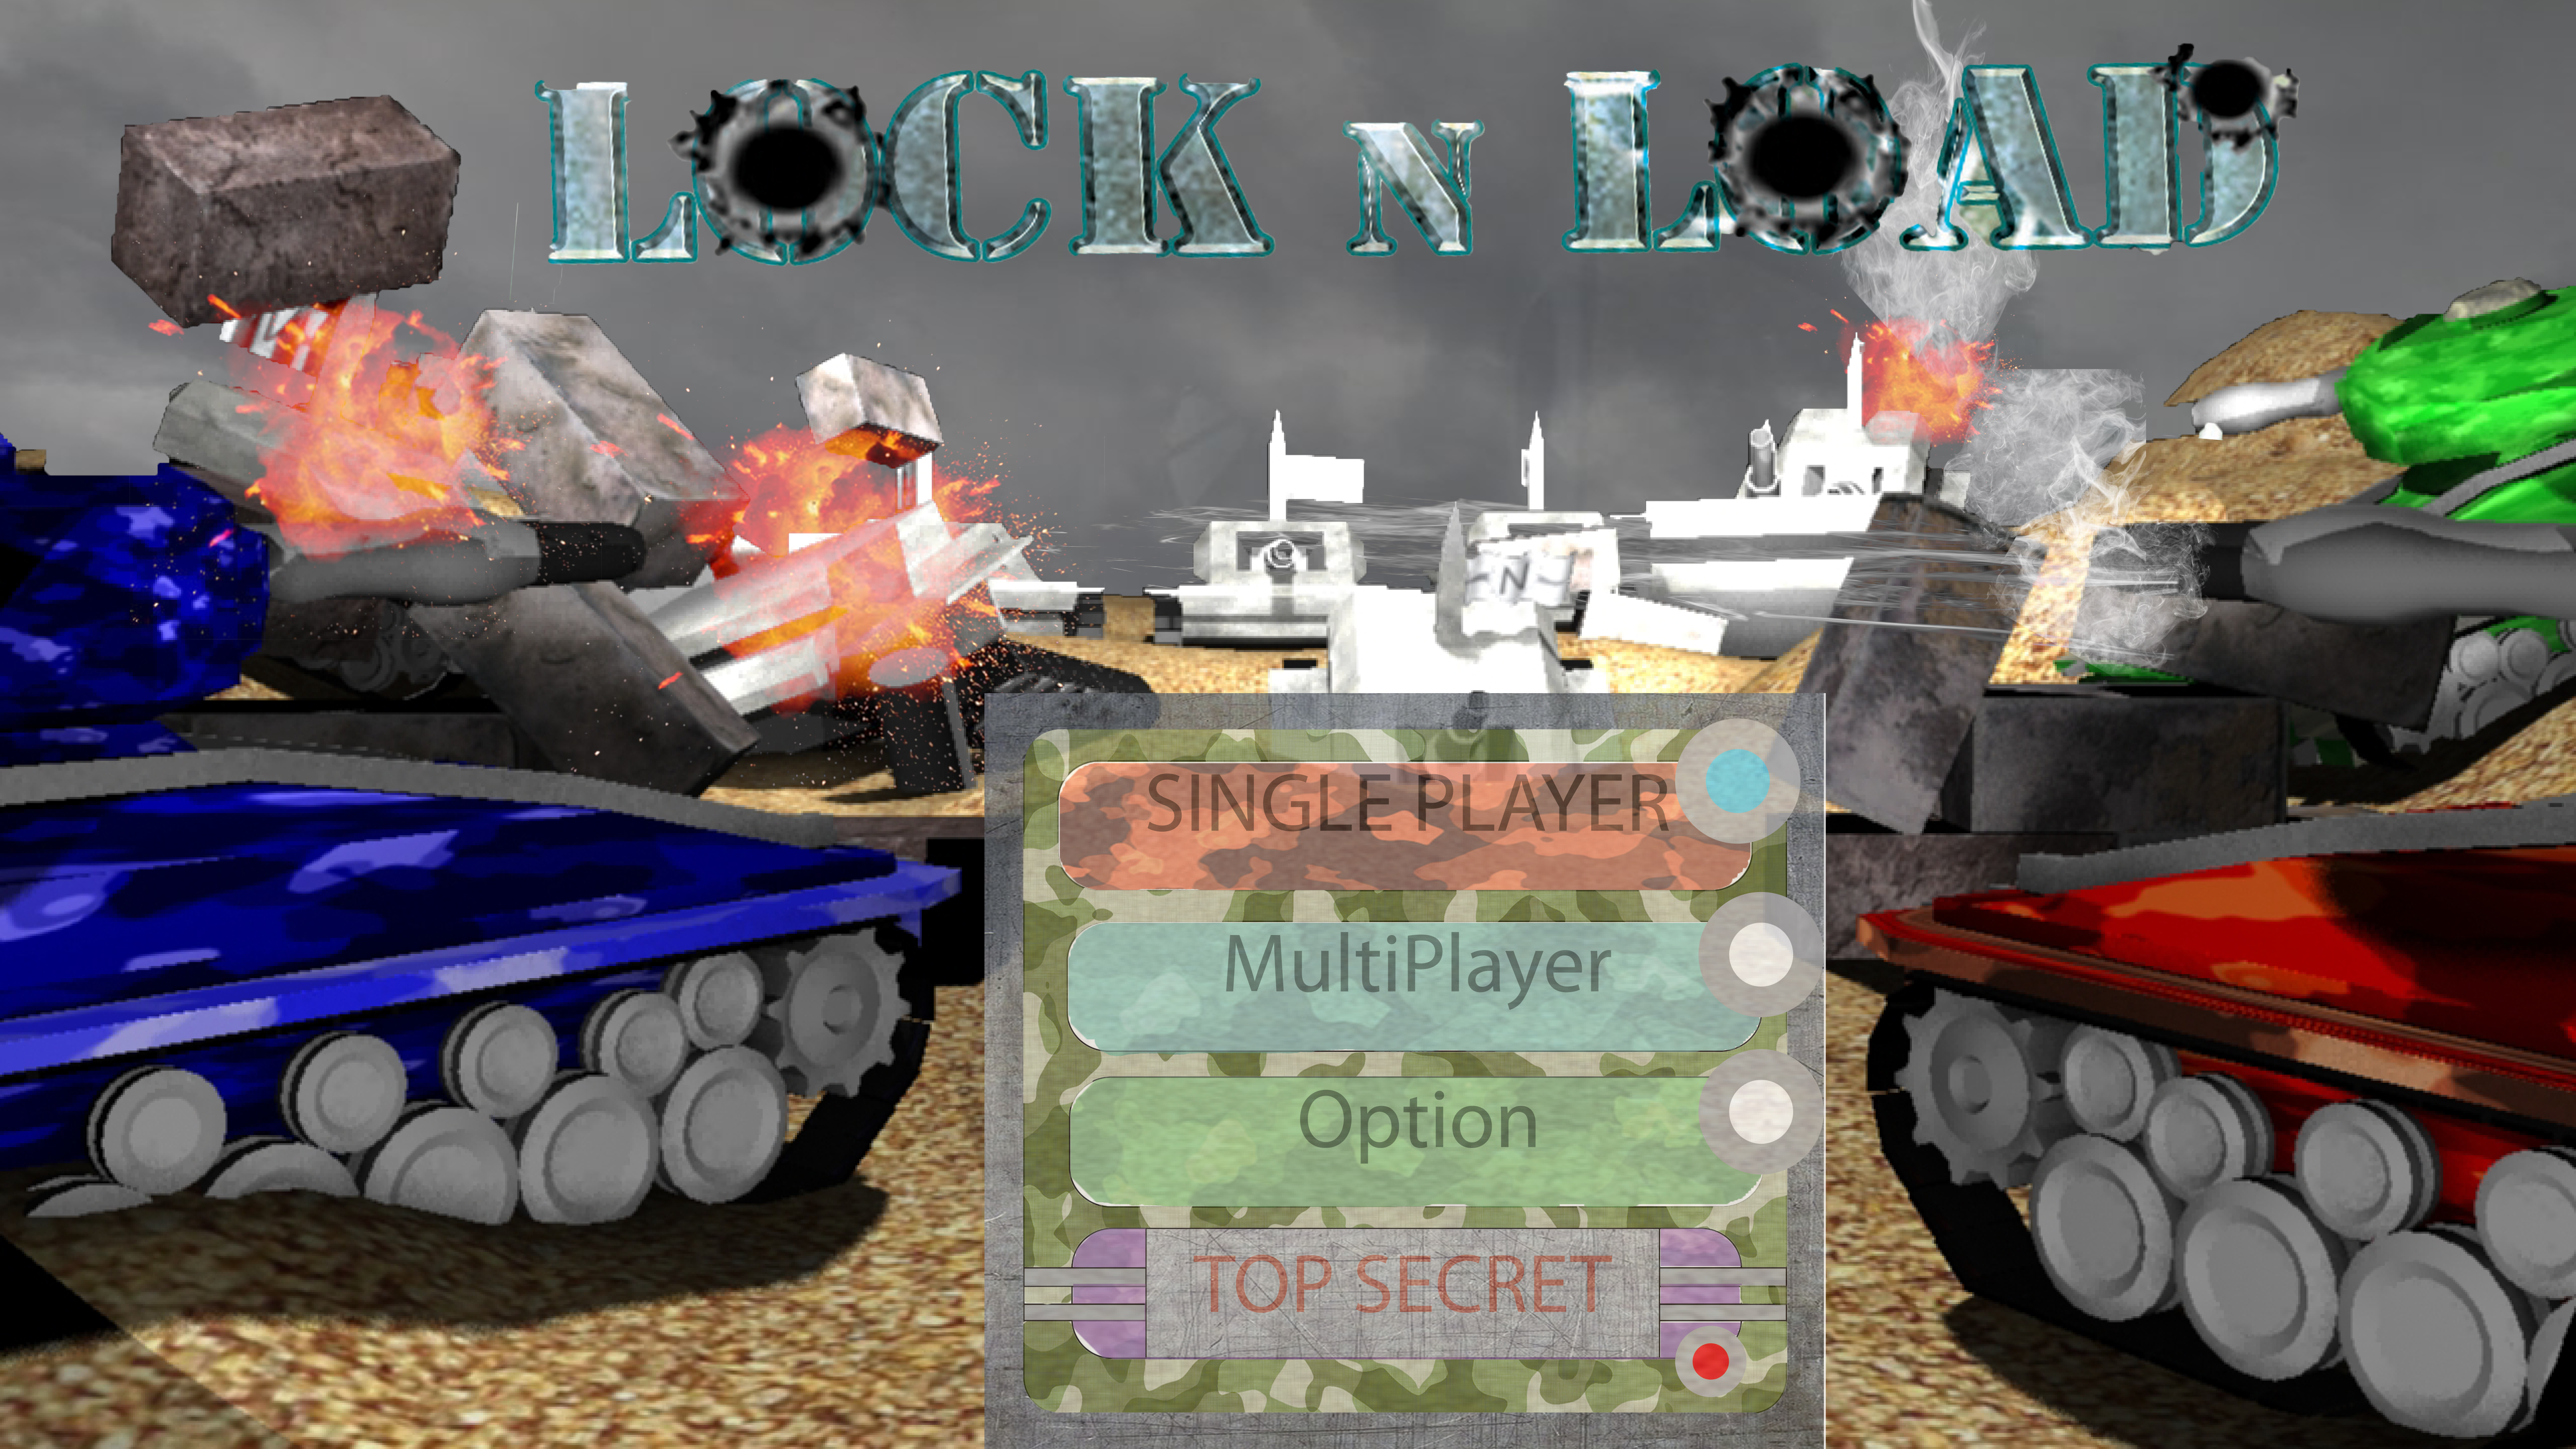 Lock N Load Title screen